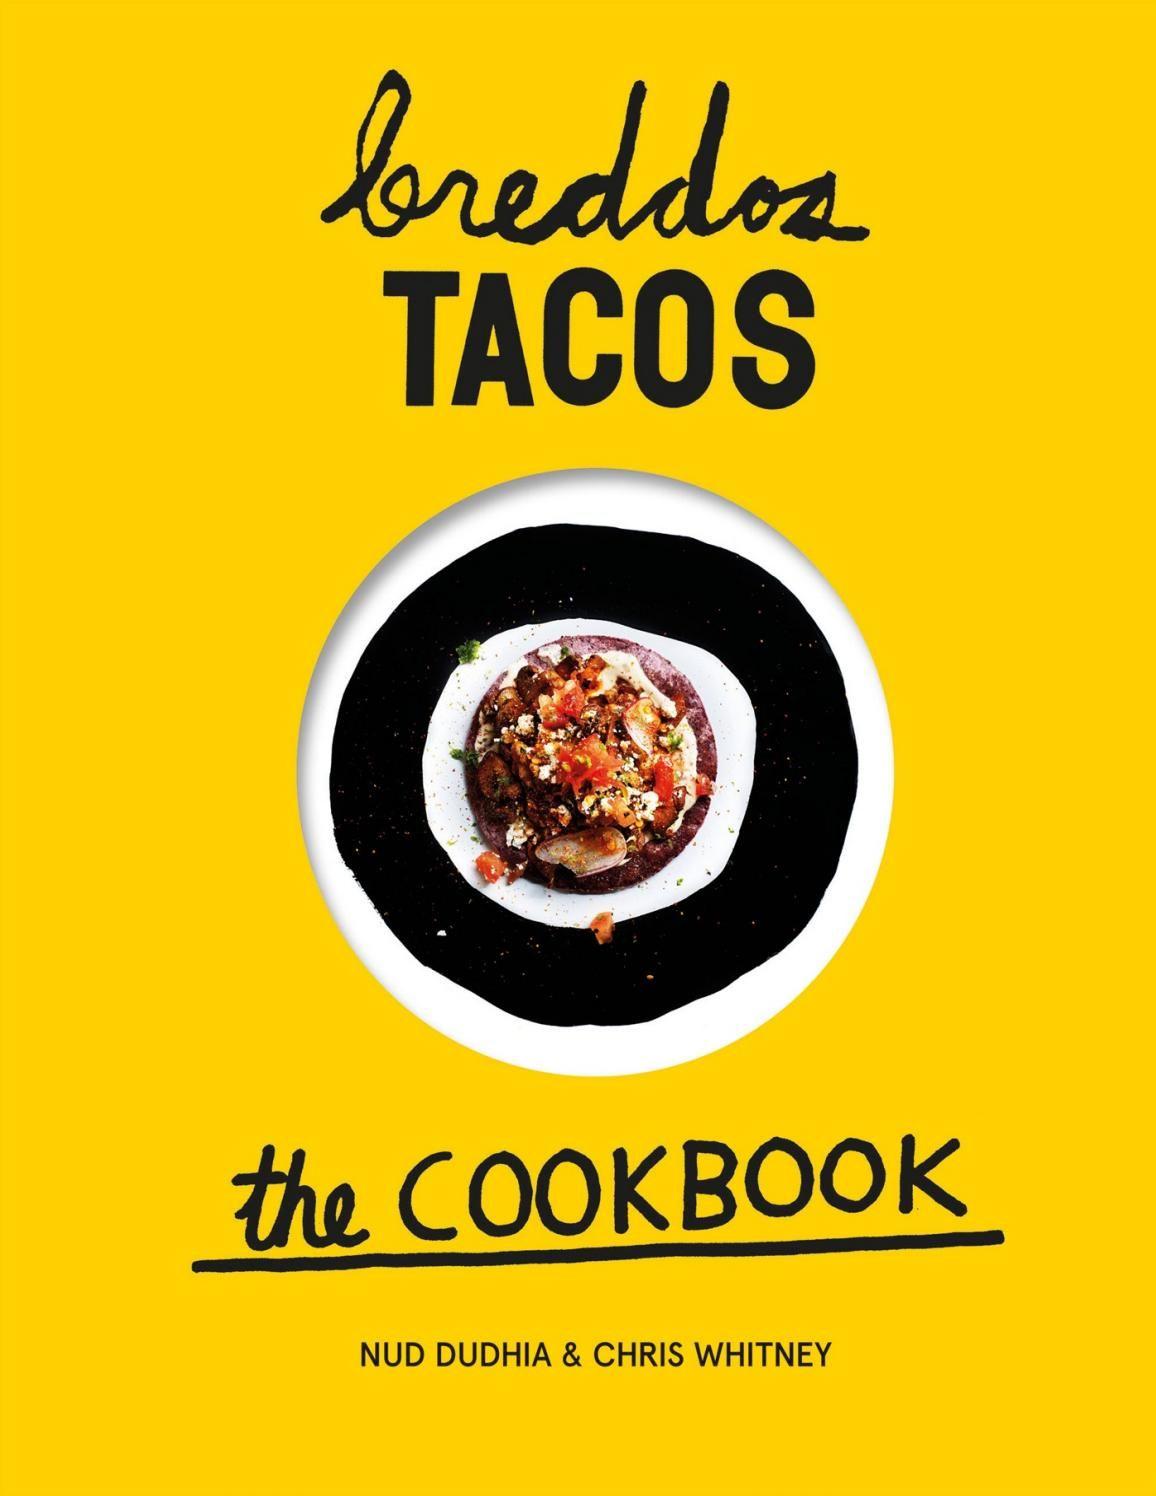 Breddos tacos the cookbook issuu pdf download my likes breddos tacos the cookbook issuu pdf download forumfinder Choice Image